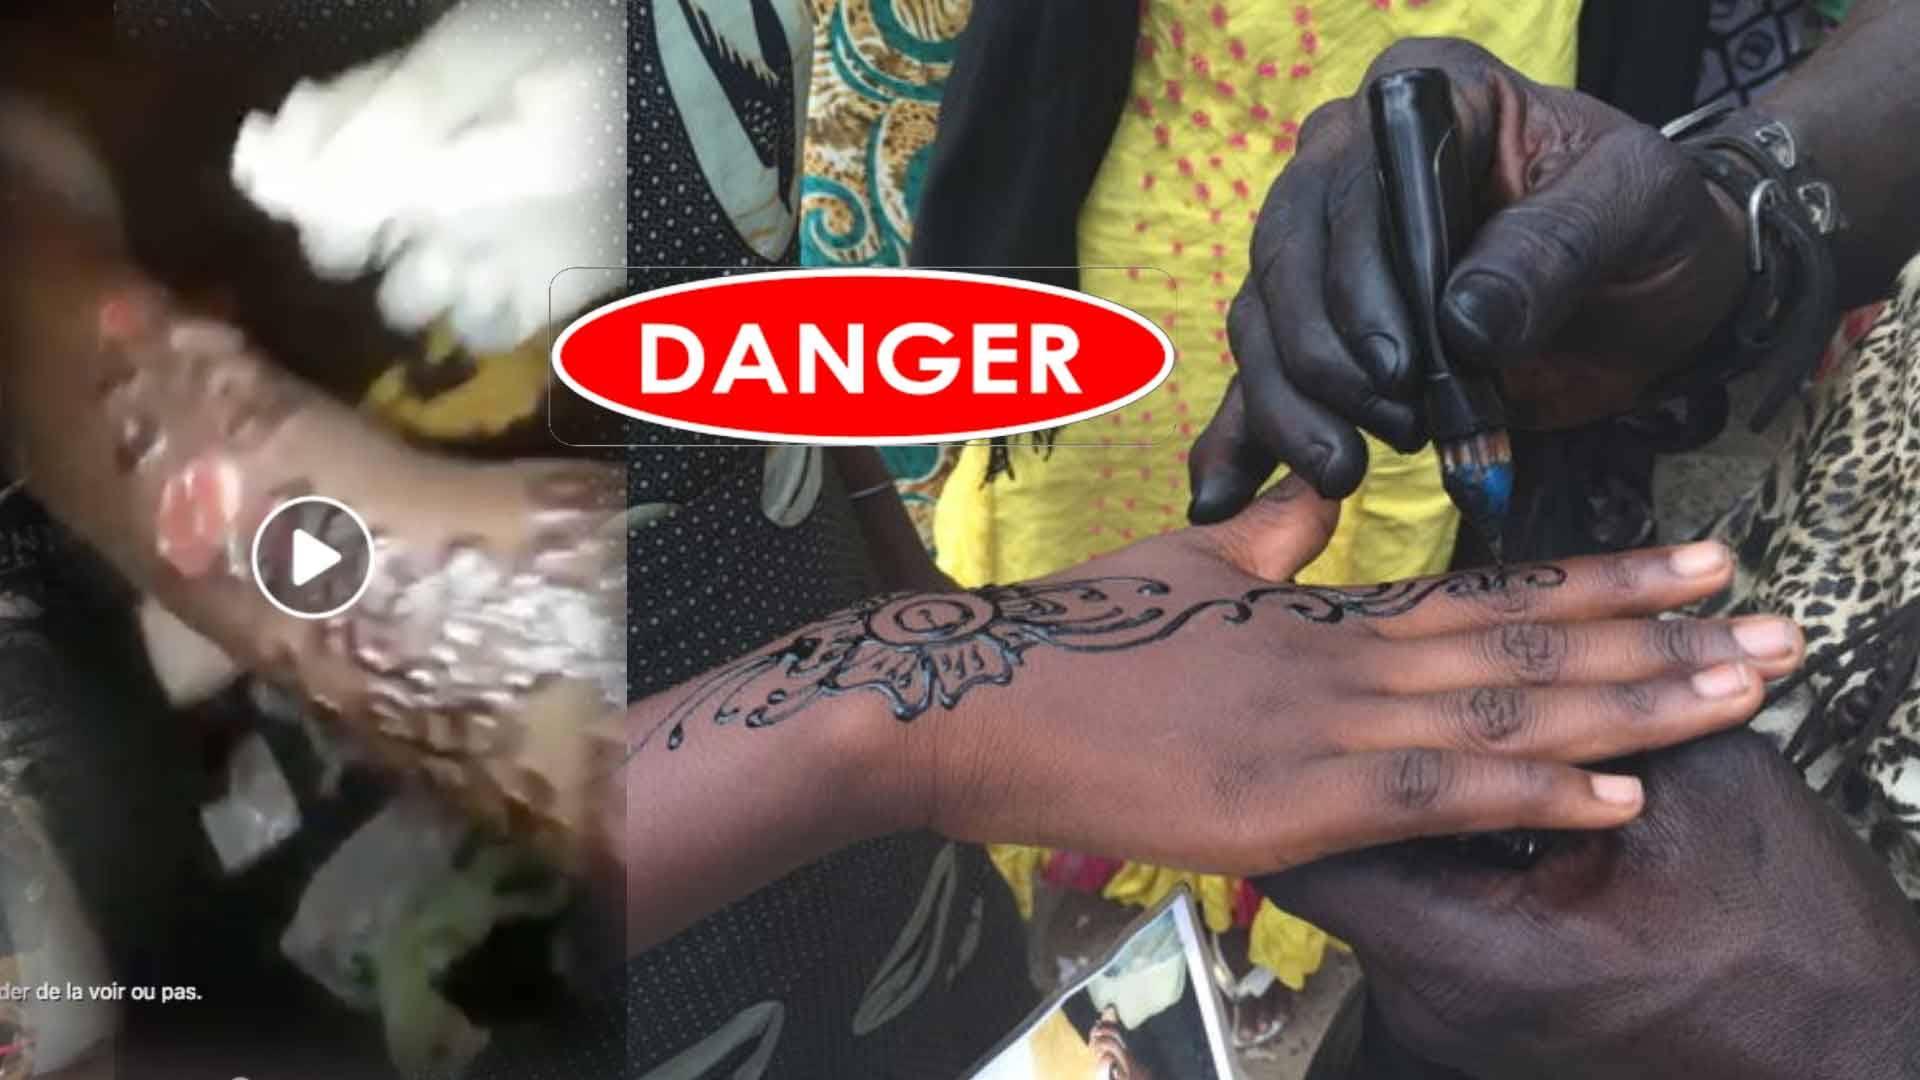 Atterrit, femme, l'hôpital, tatouer